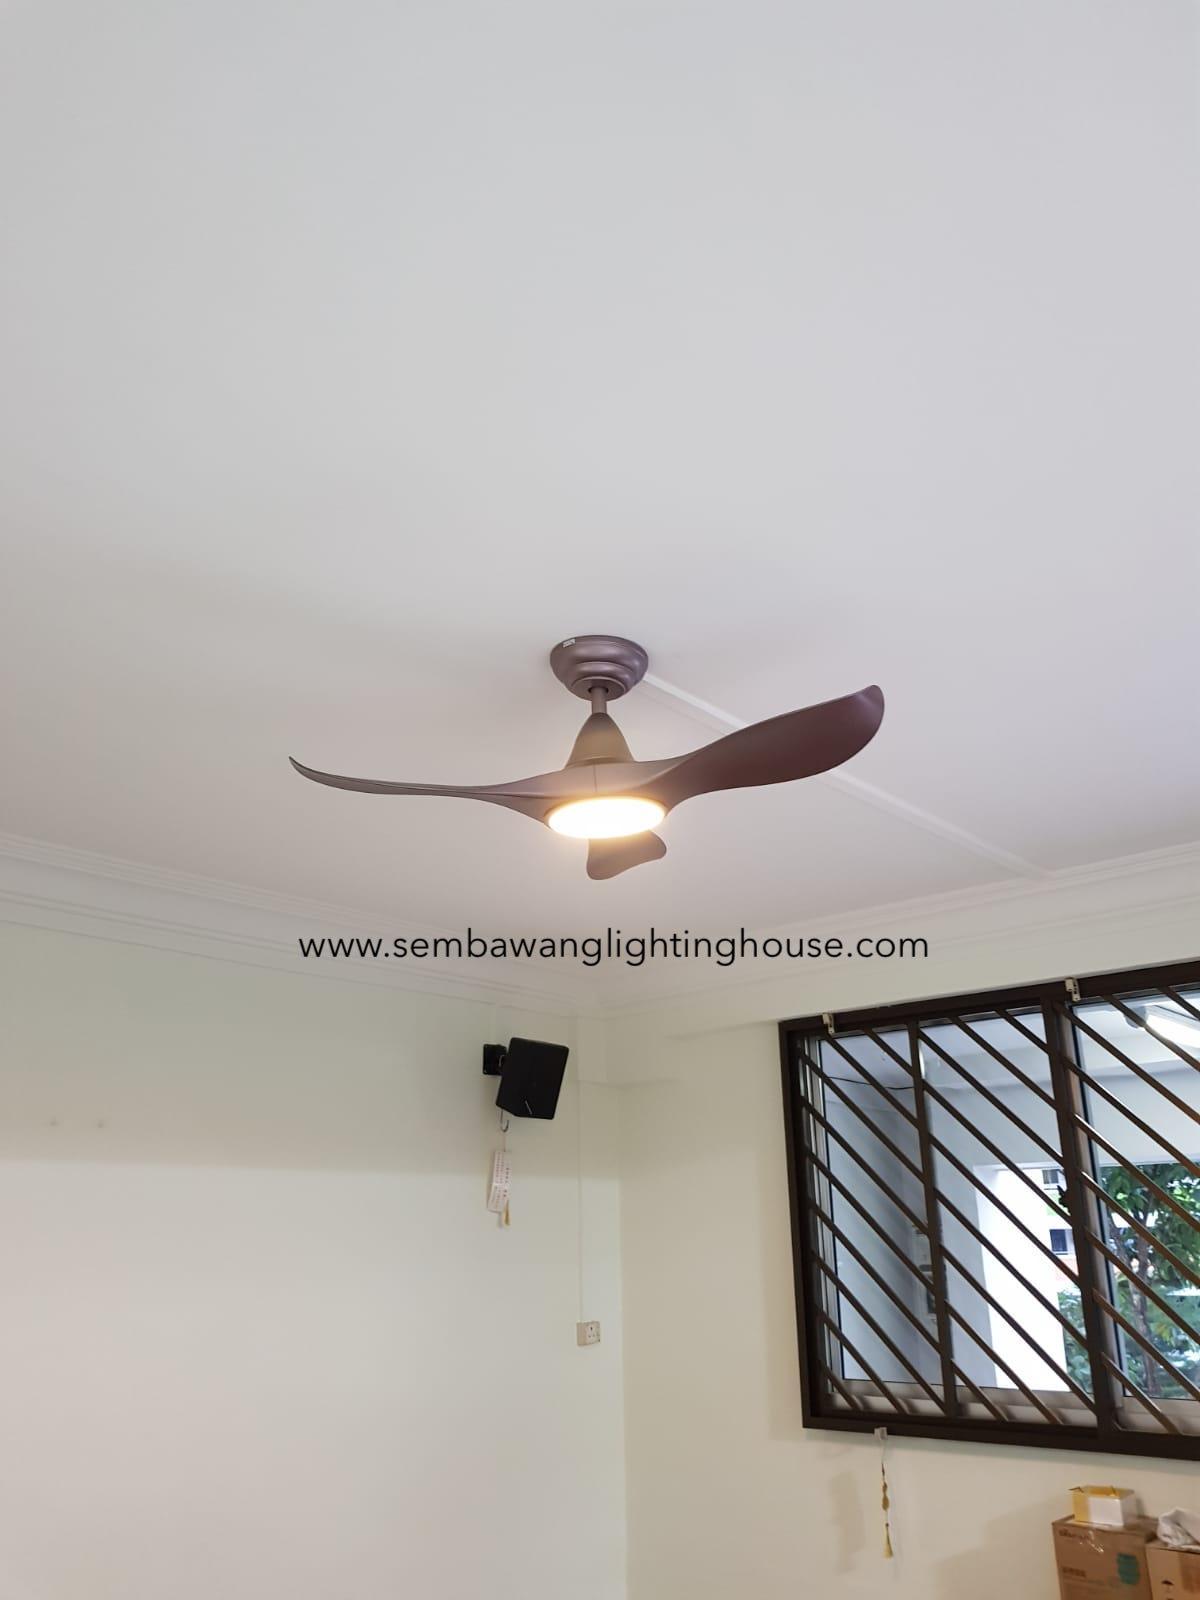 efenz-rod-ceiling-fan-with-light-midnight-titanium-sembawang-lighting-house-05.jpg